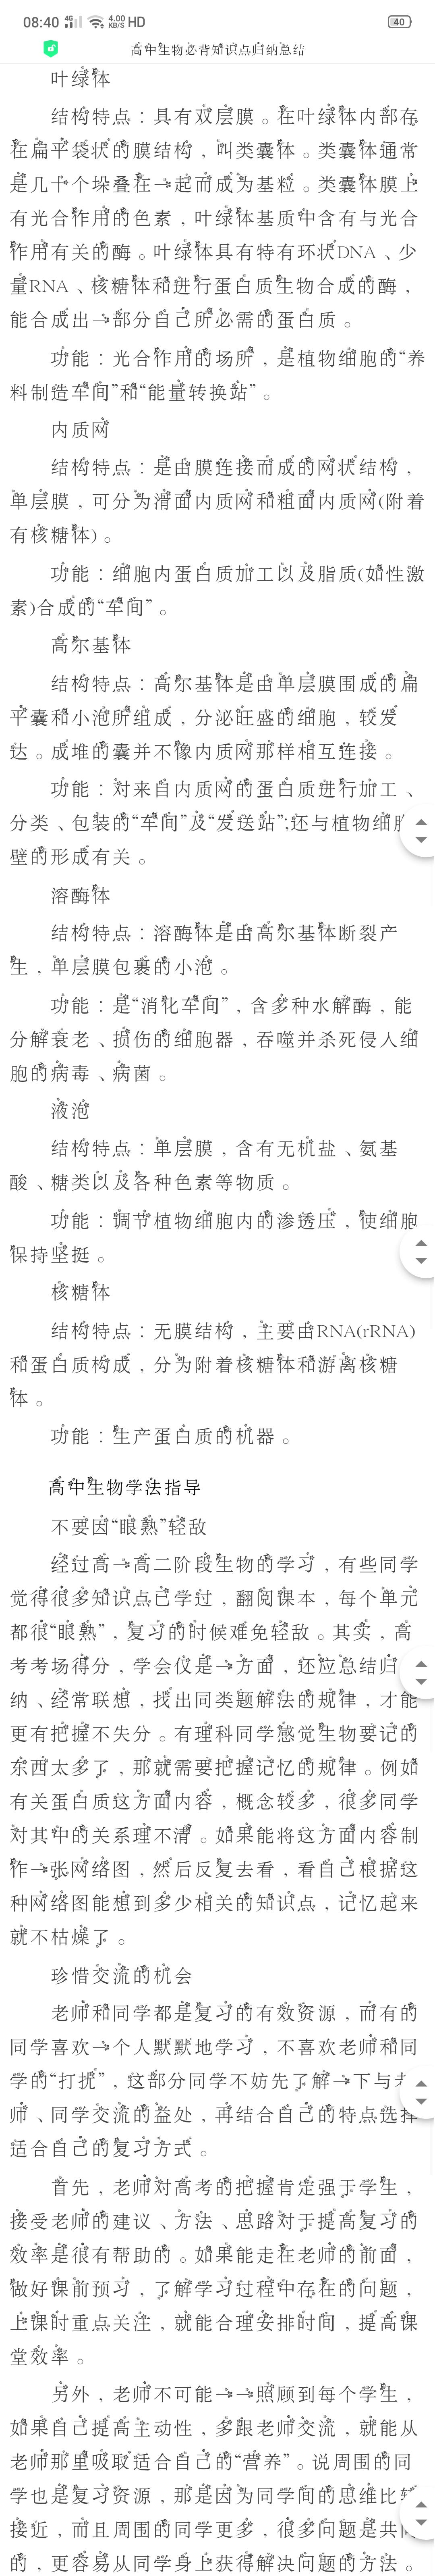 Screenshot_2019-07-26-08-40-42-68.png